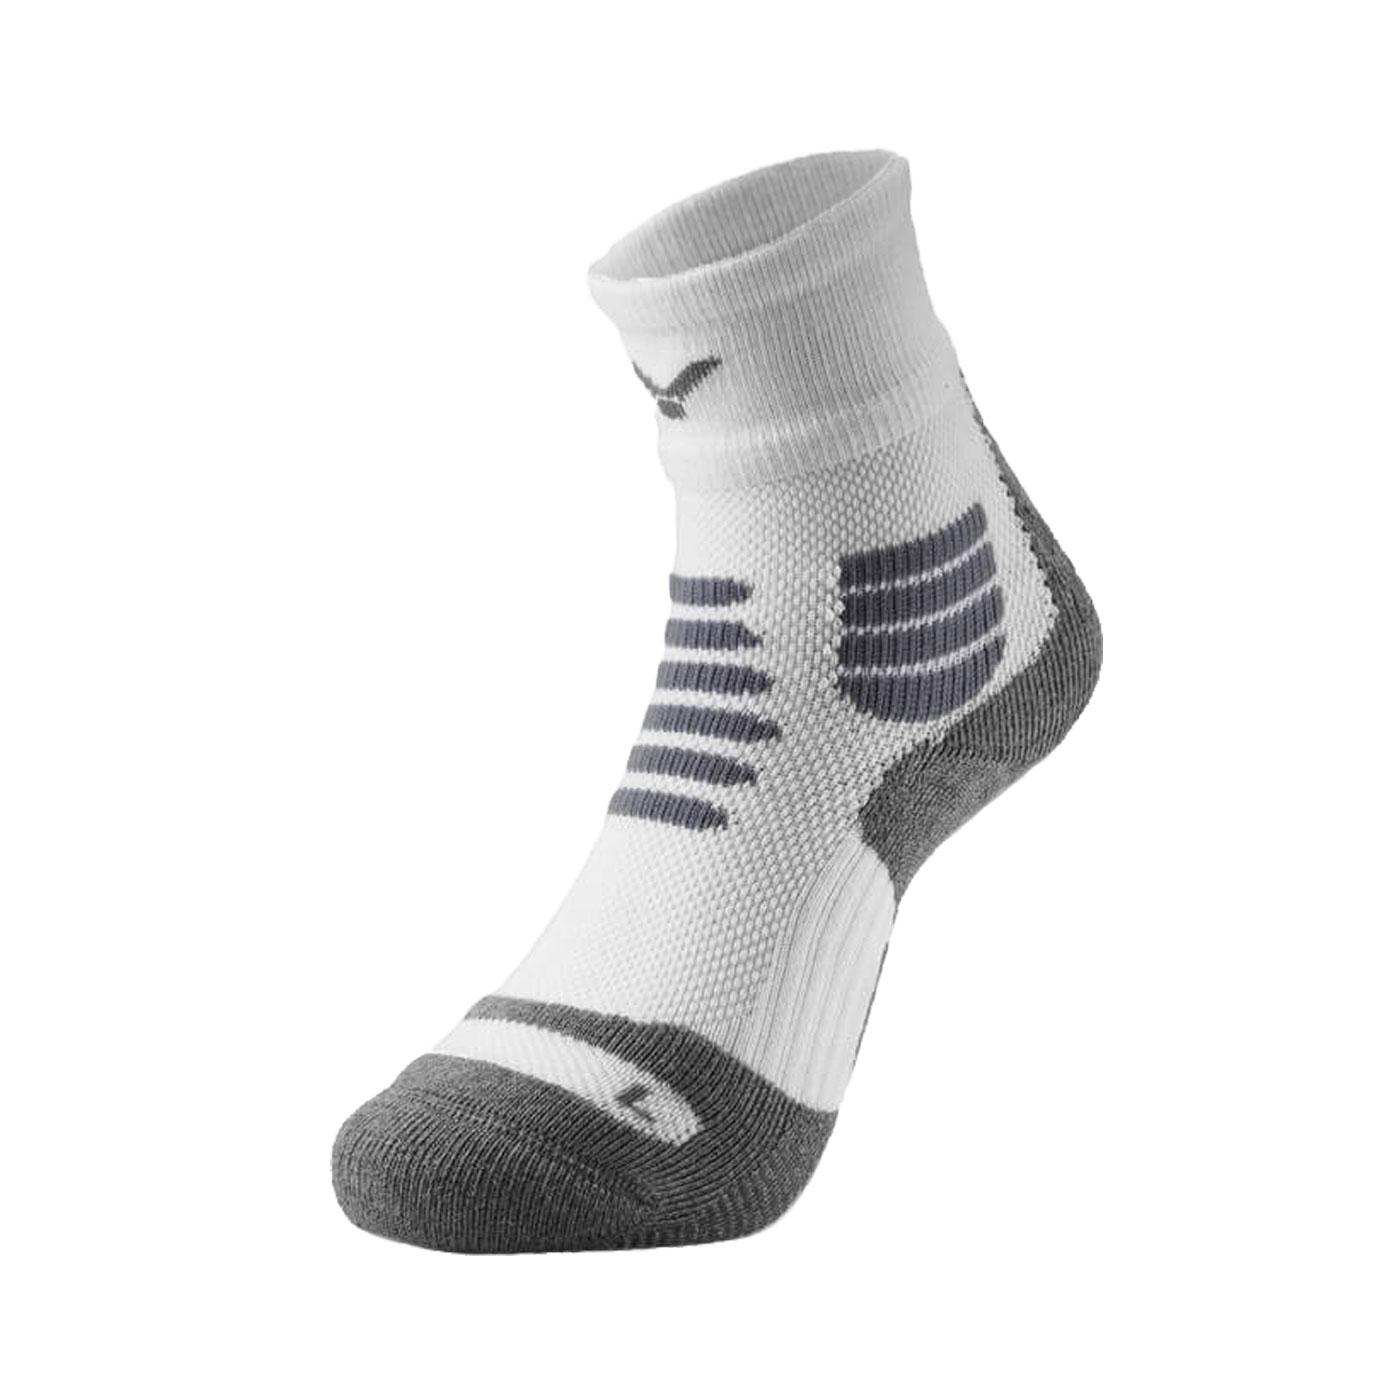 VICTOR 專業羽球襪 C-5054A - 白灰棕